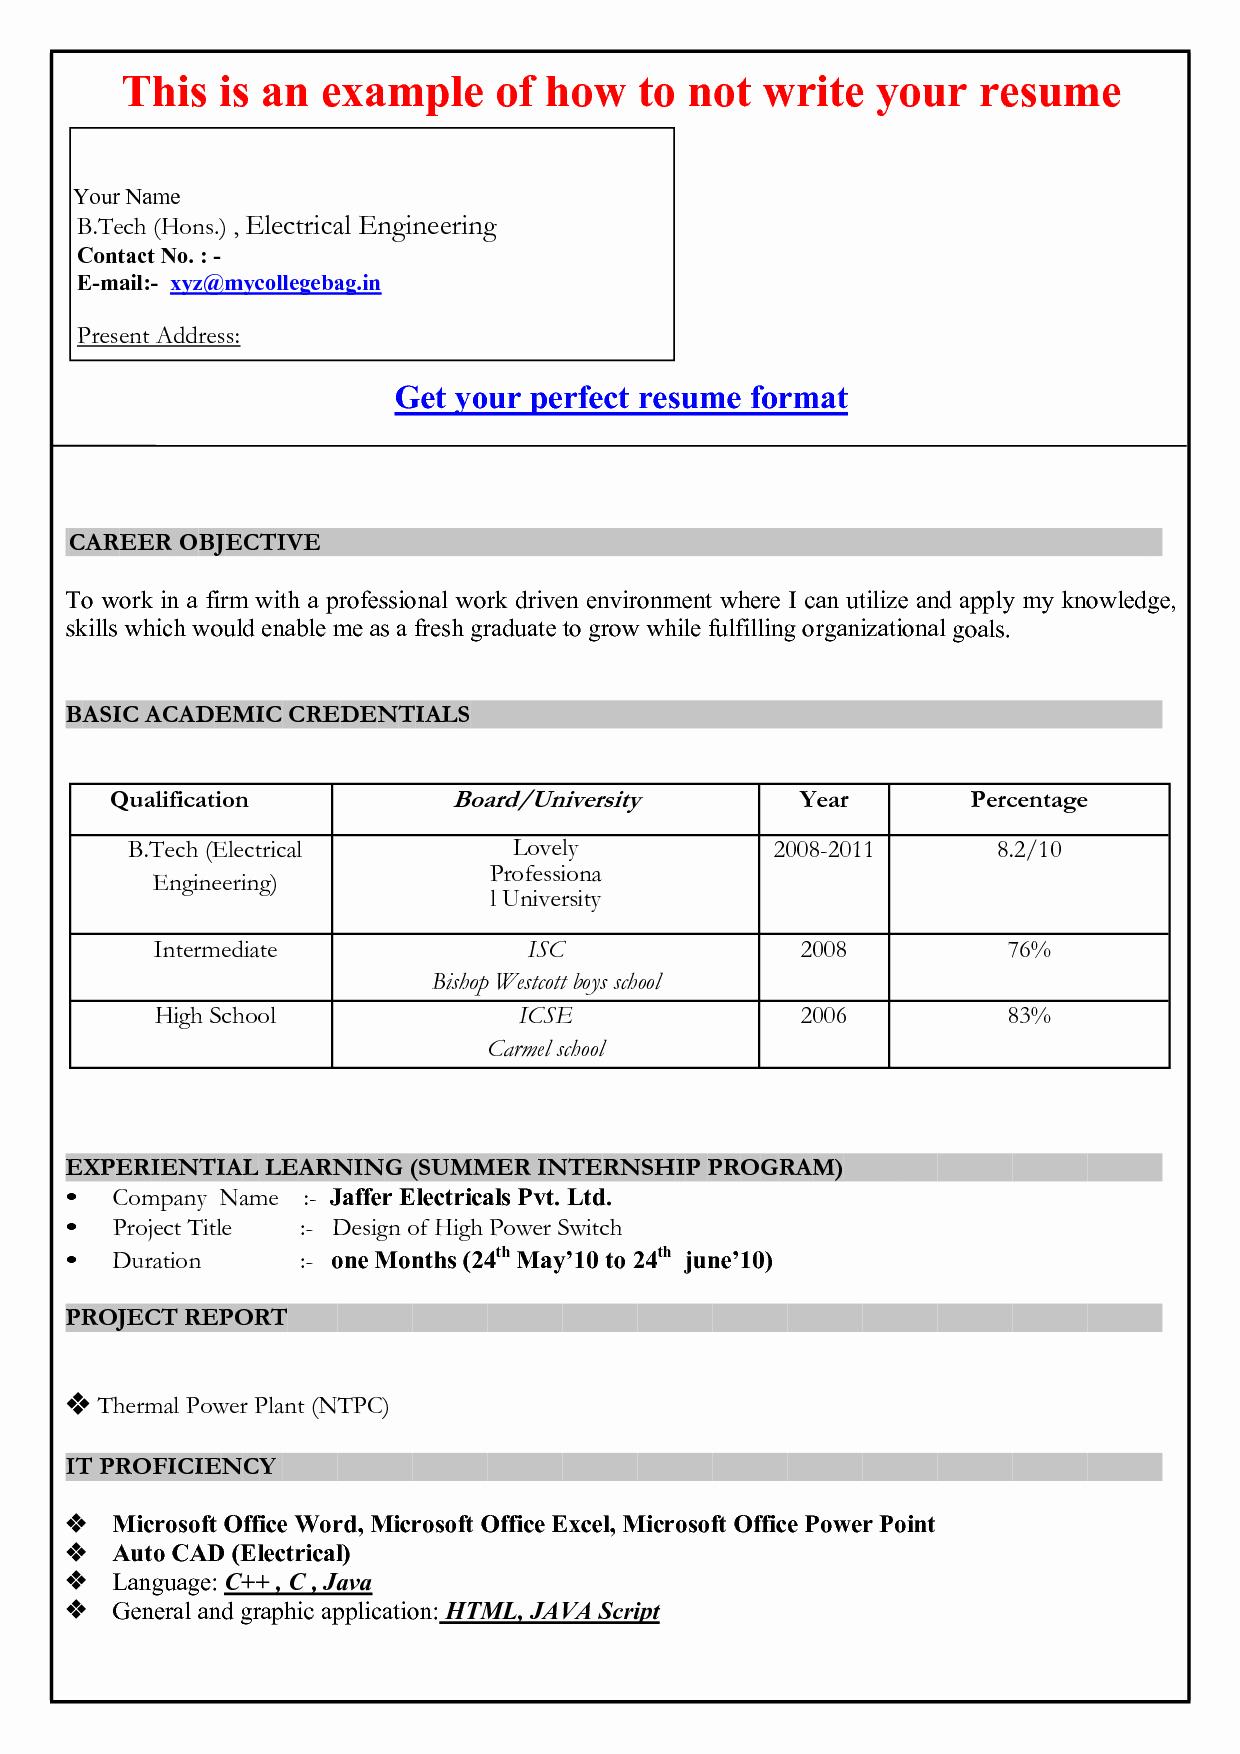 Resumes On Microsoft Word 2007 Beautiful Cv Template In Microsoft Word 2007